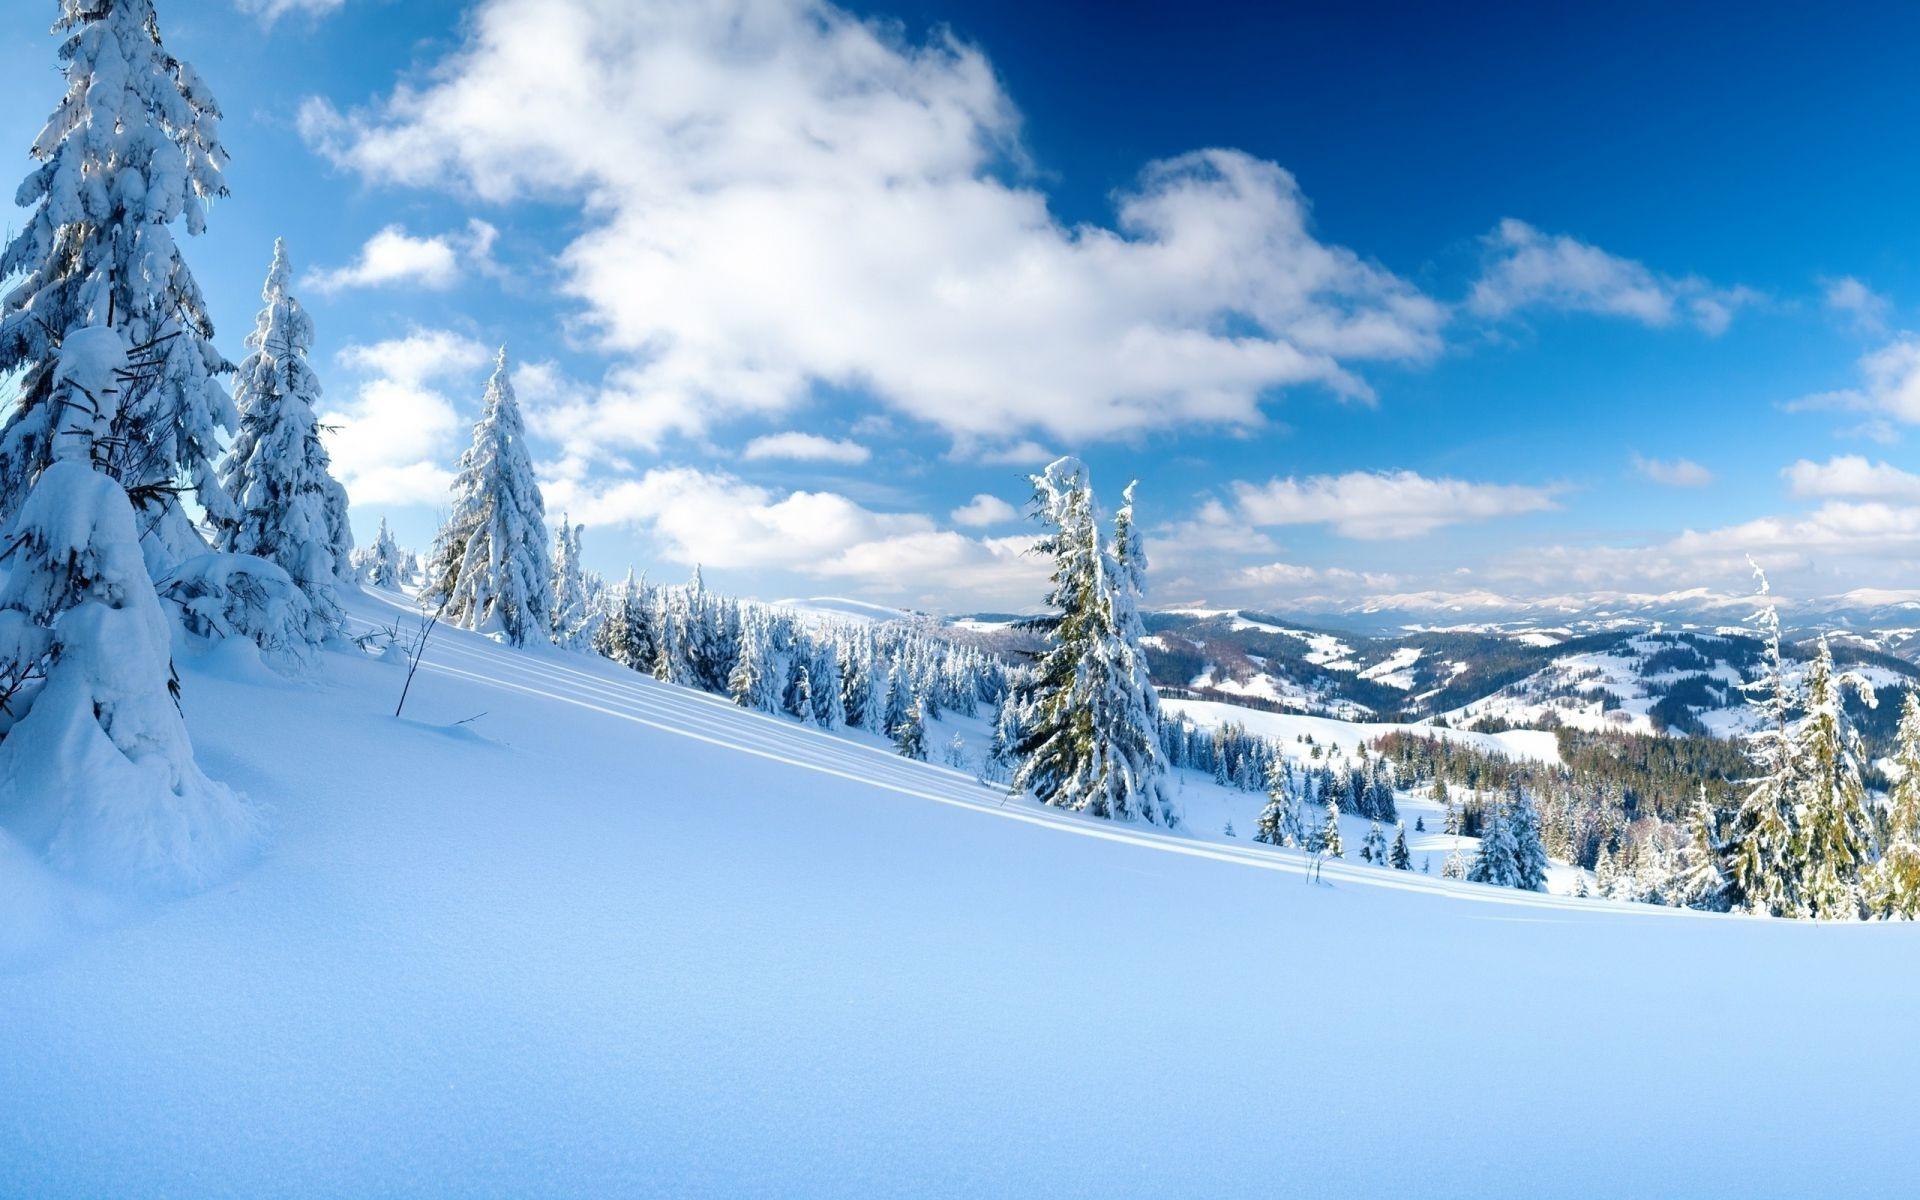 Сибирь зима обои на рабочий стол